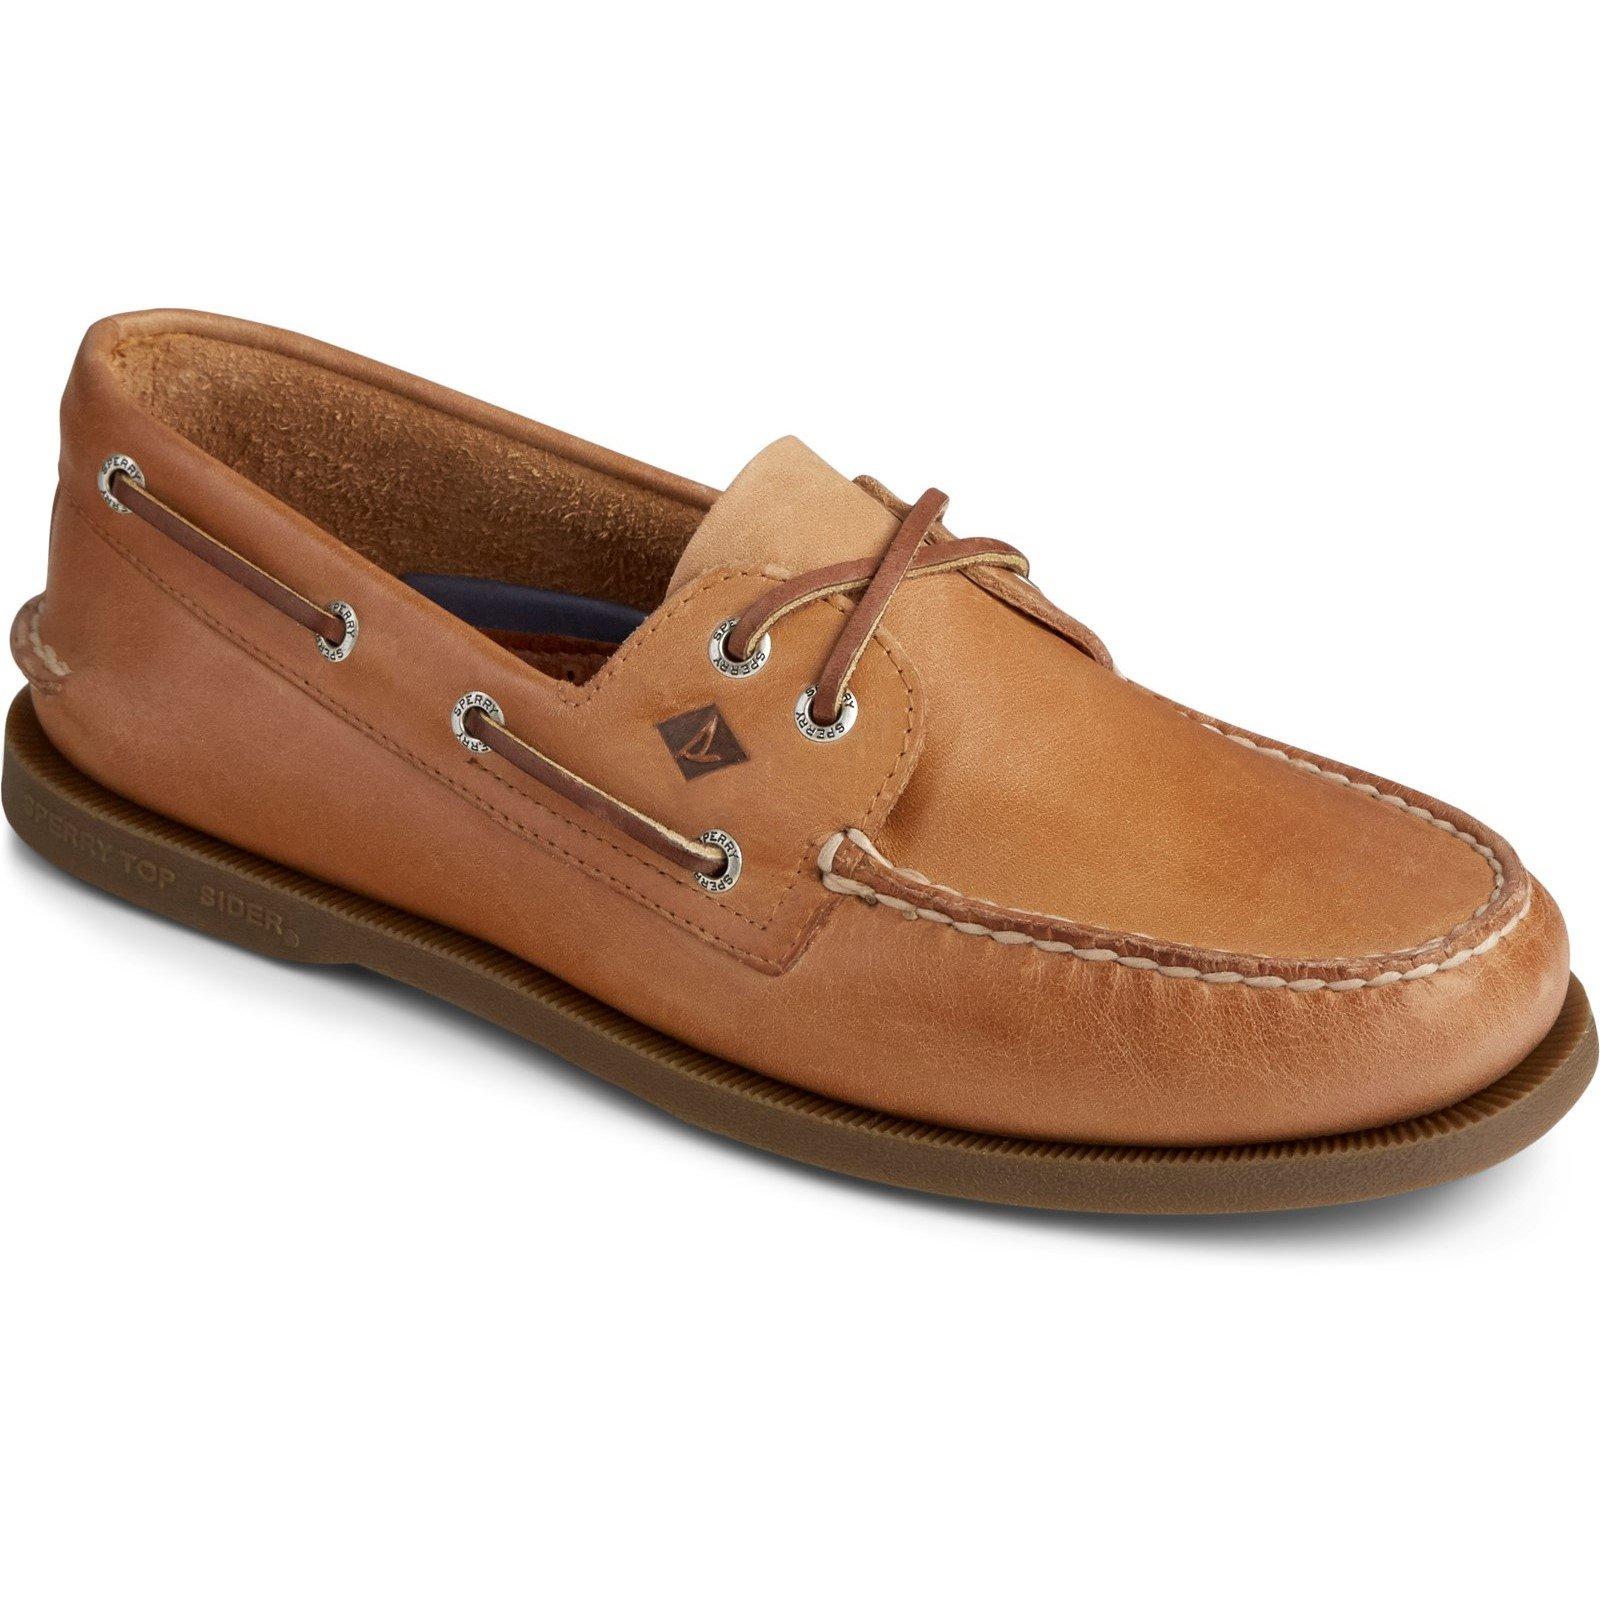 Sperry Men's Authentic Original Leather Boat Shoe Various Colours 31524 - Nutmeg 10